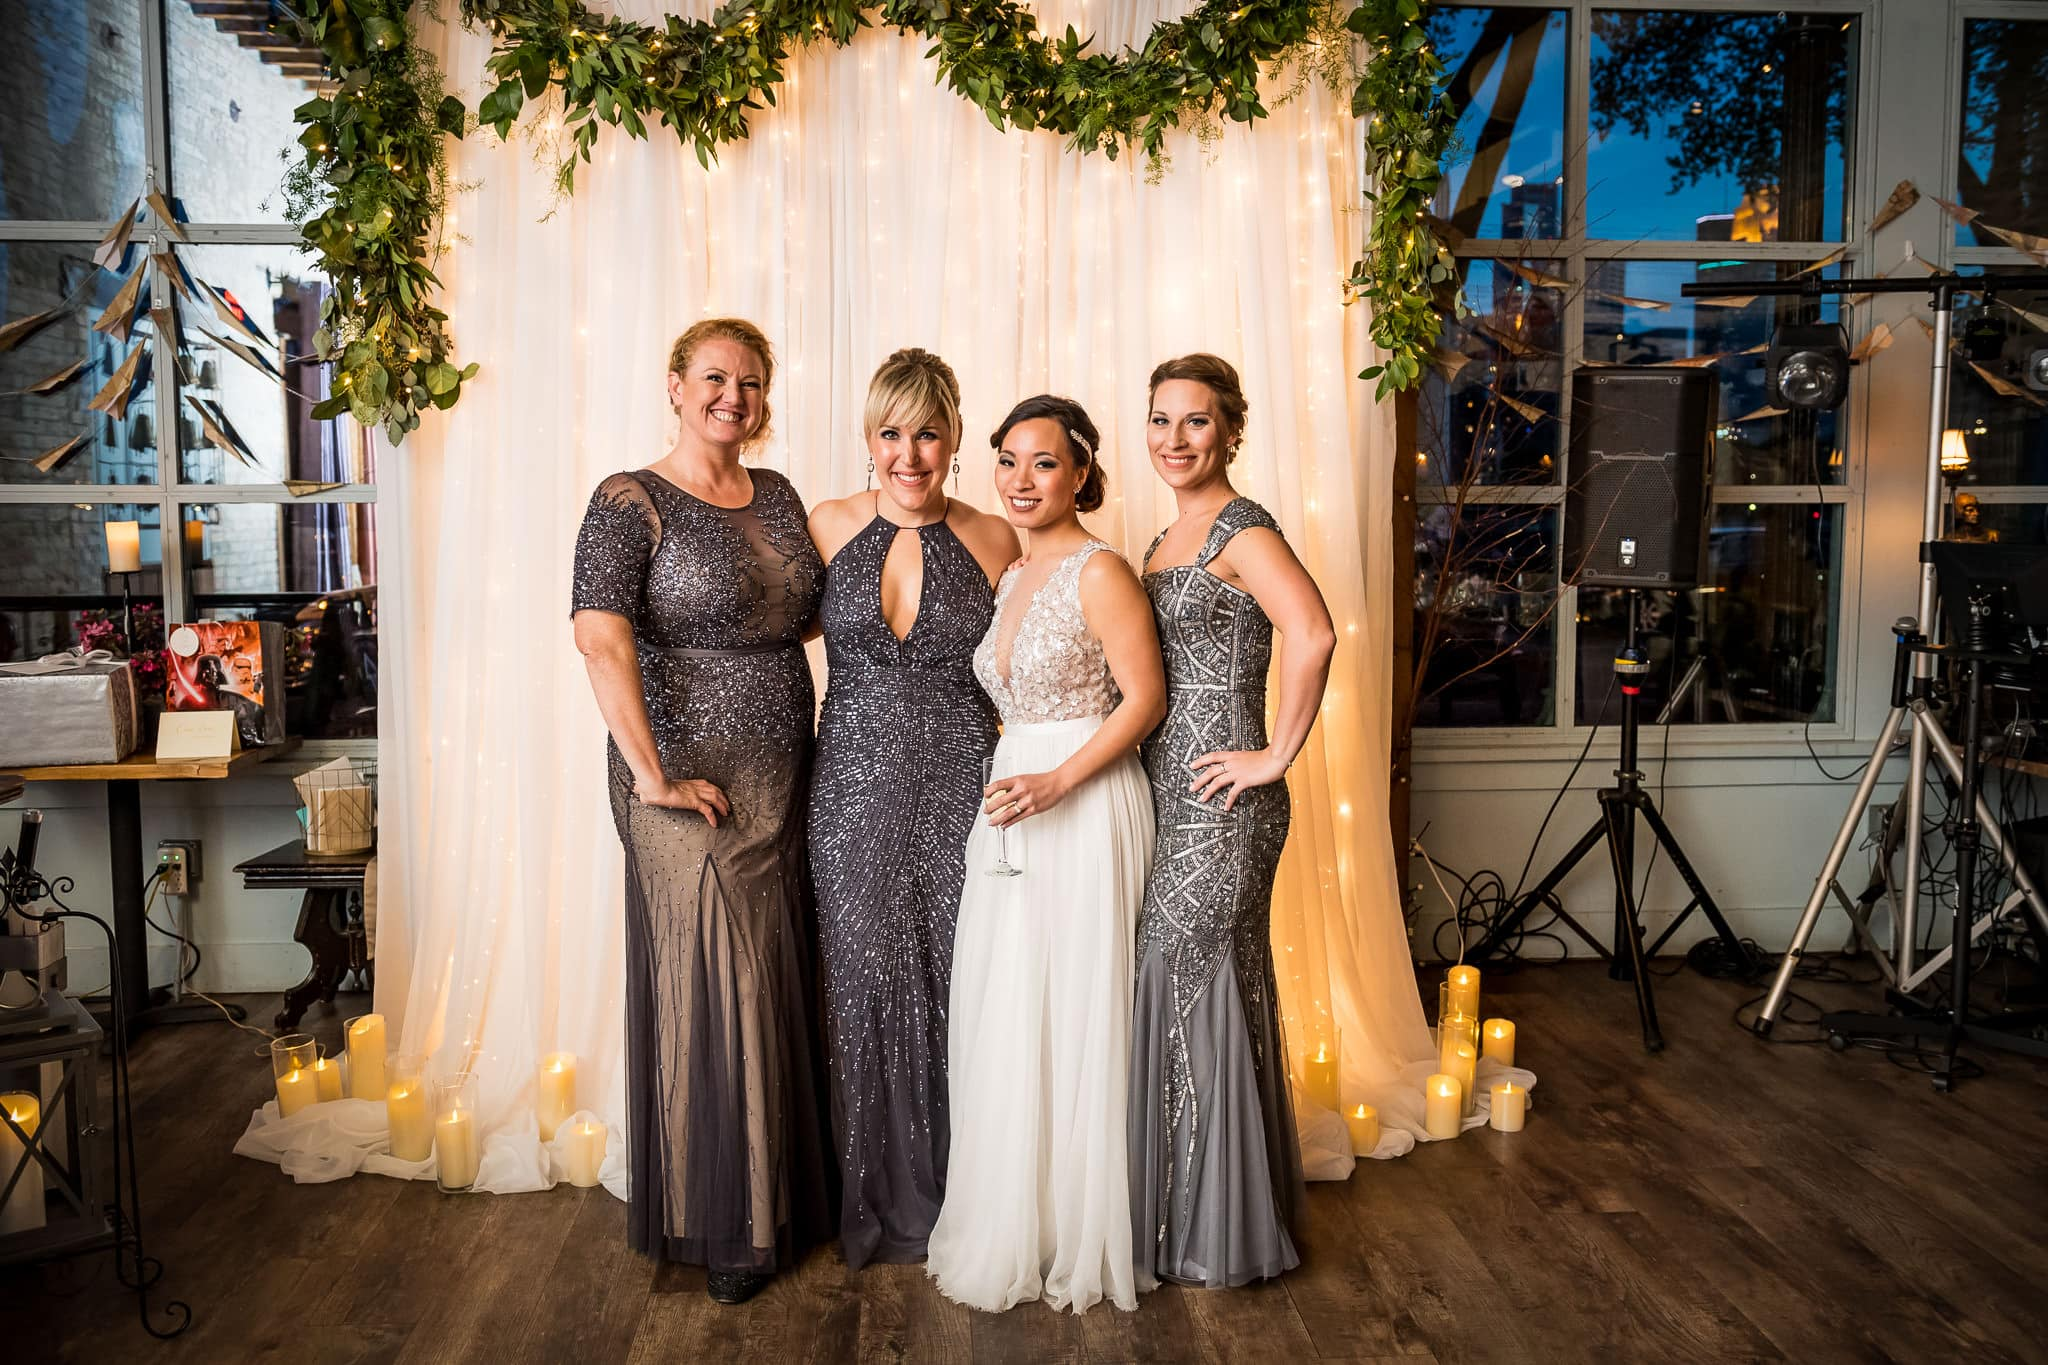 Aster Cafe Wedding Photos Alter Shot with Bridesmaids